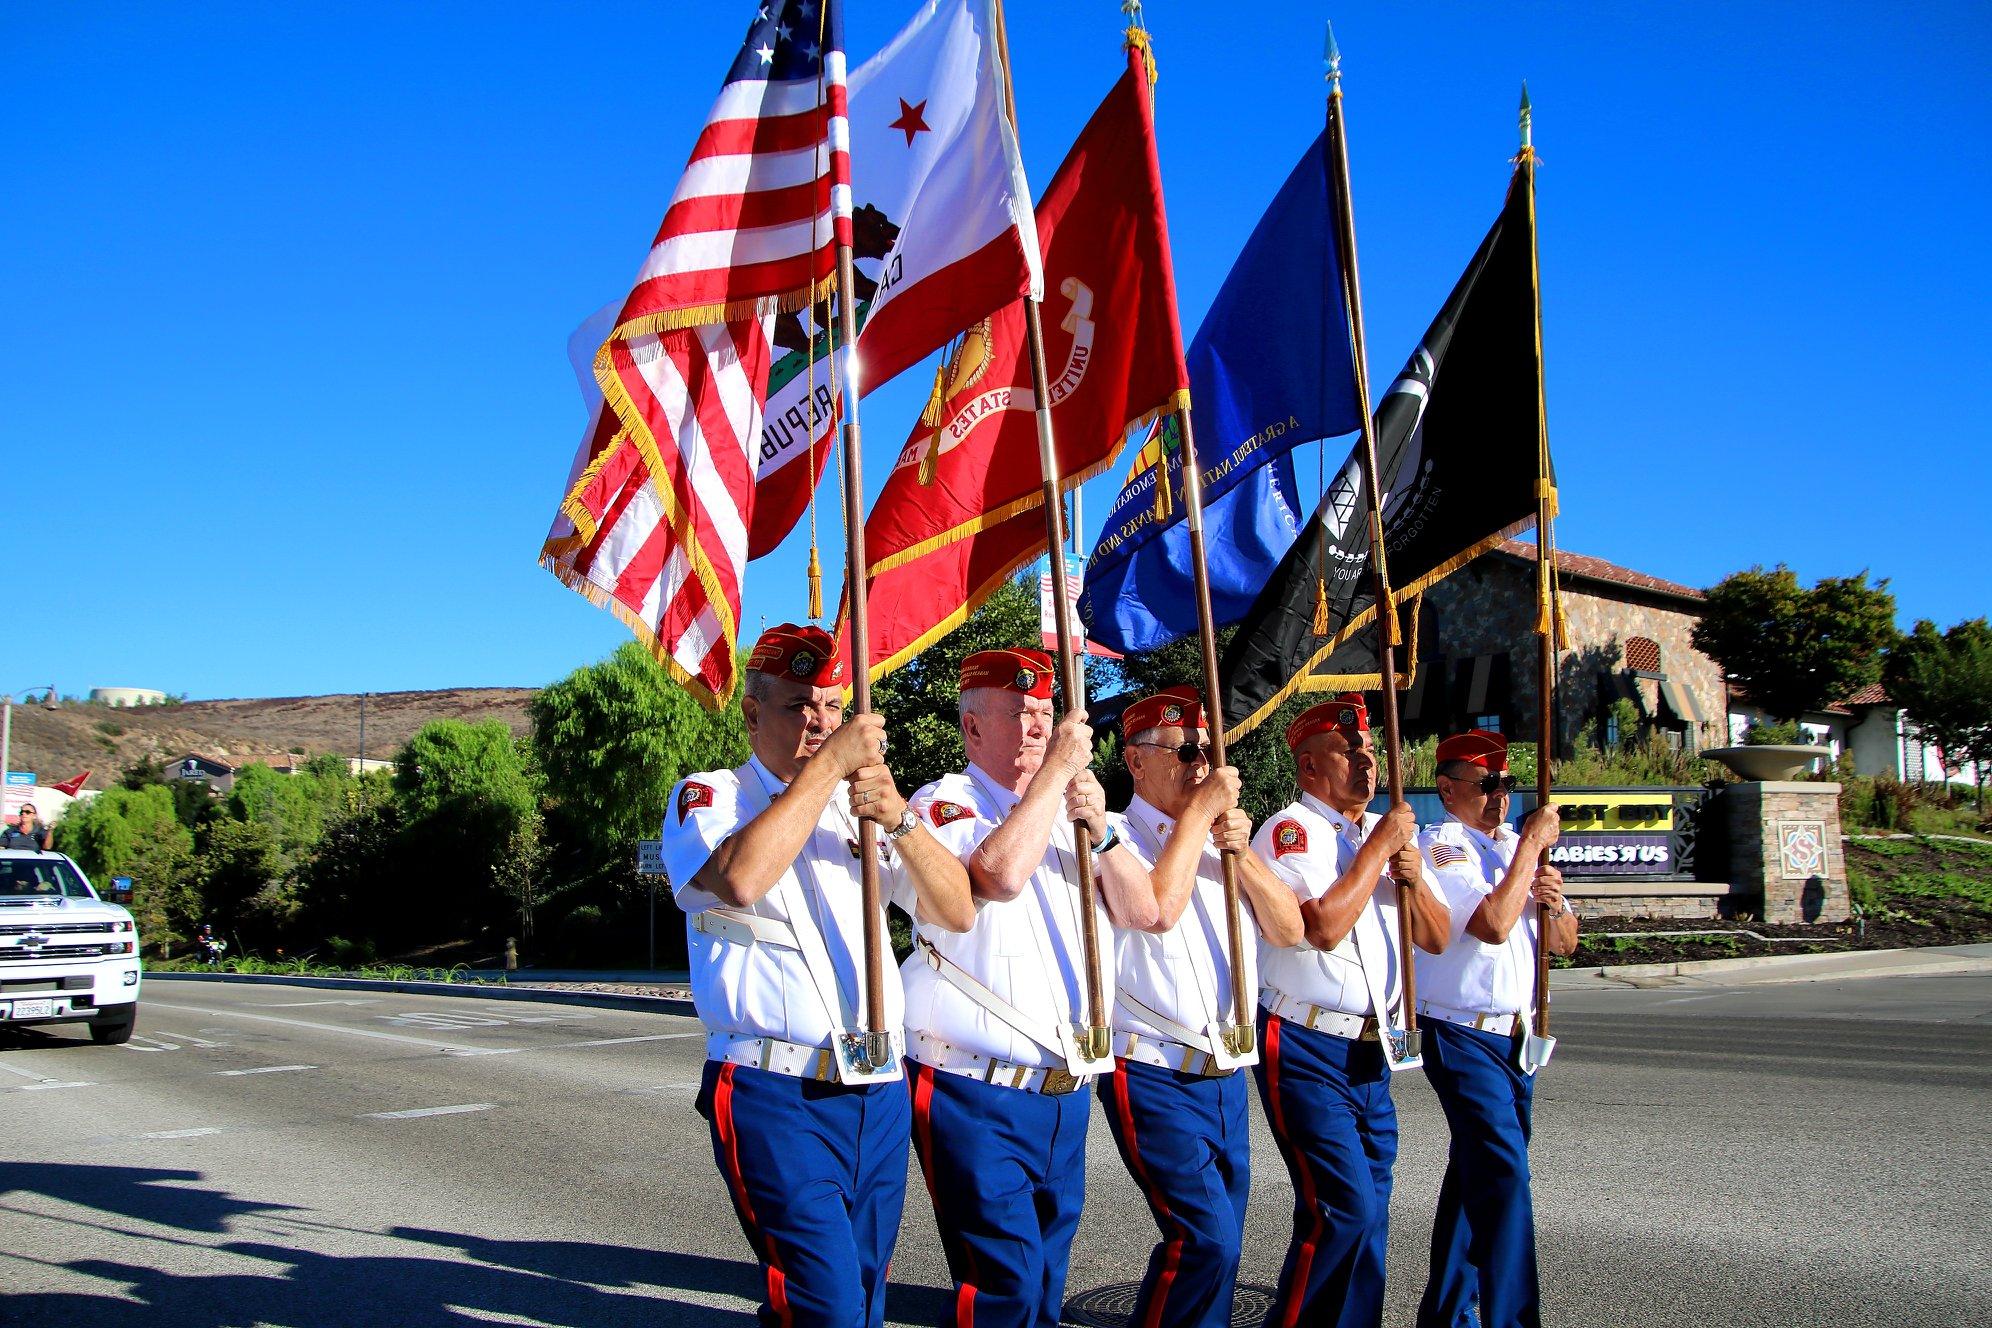 2018   Simi Valley Days  Color Guard leading parade.  Color Guard Commander - Ruy Pena, Jr.